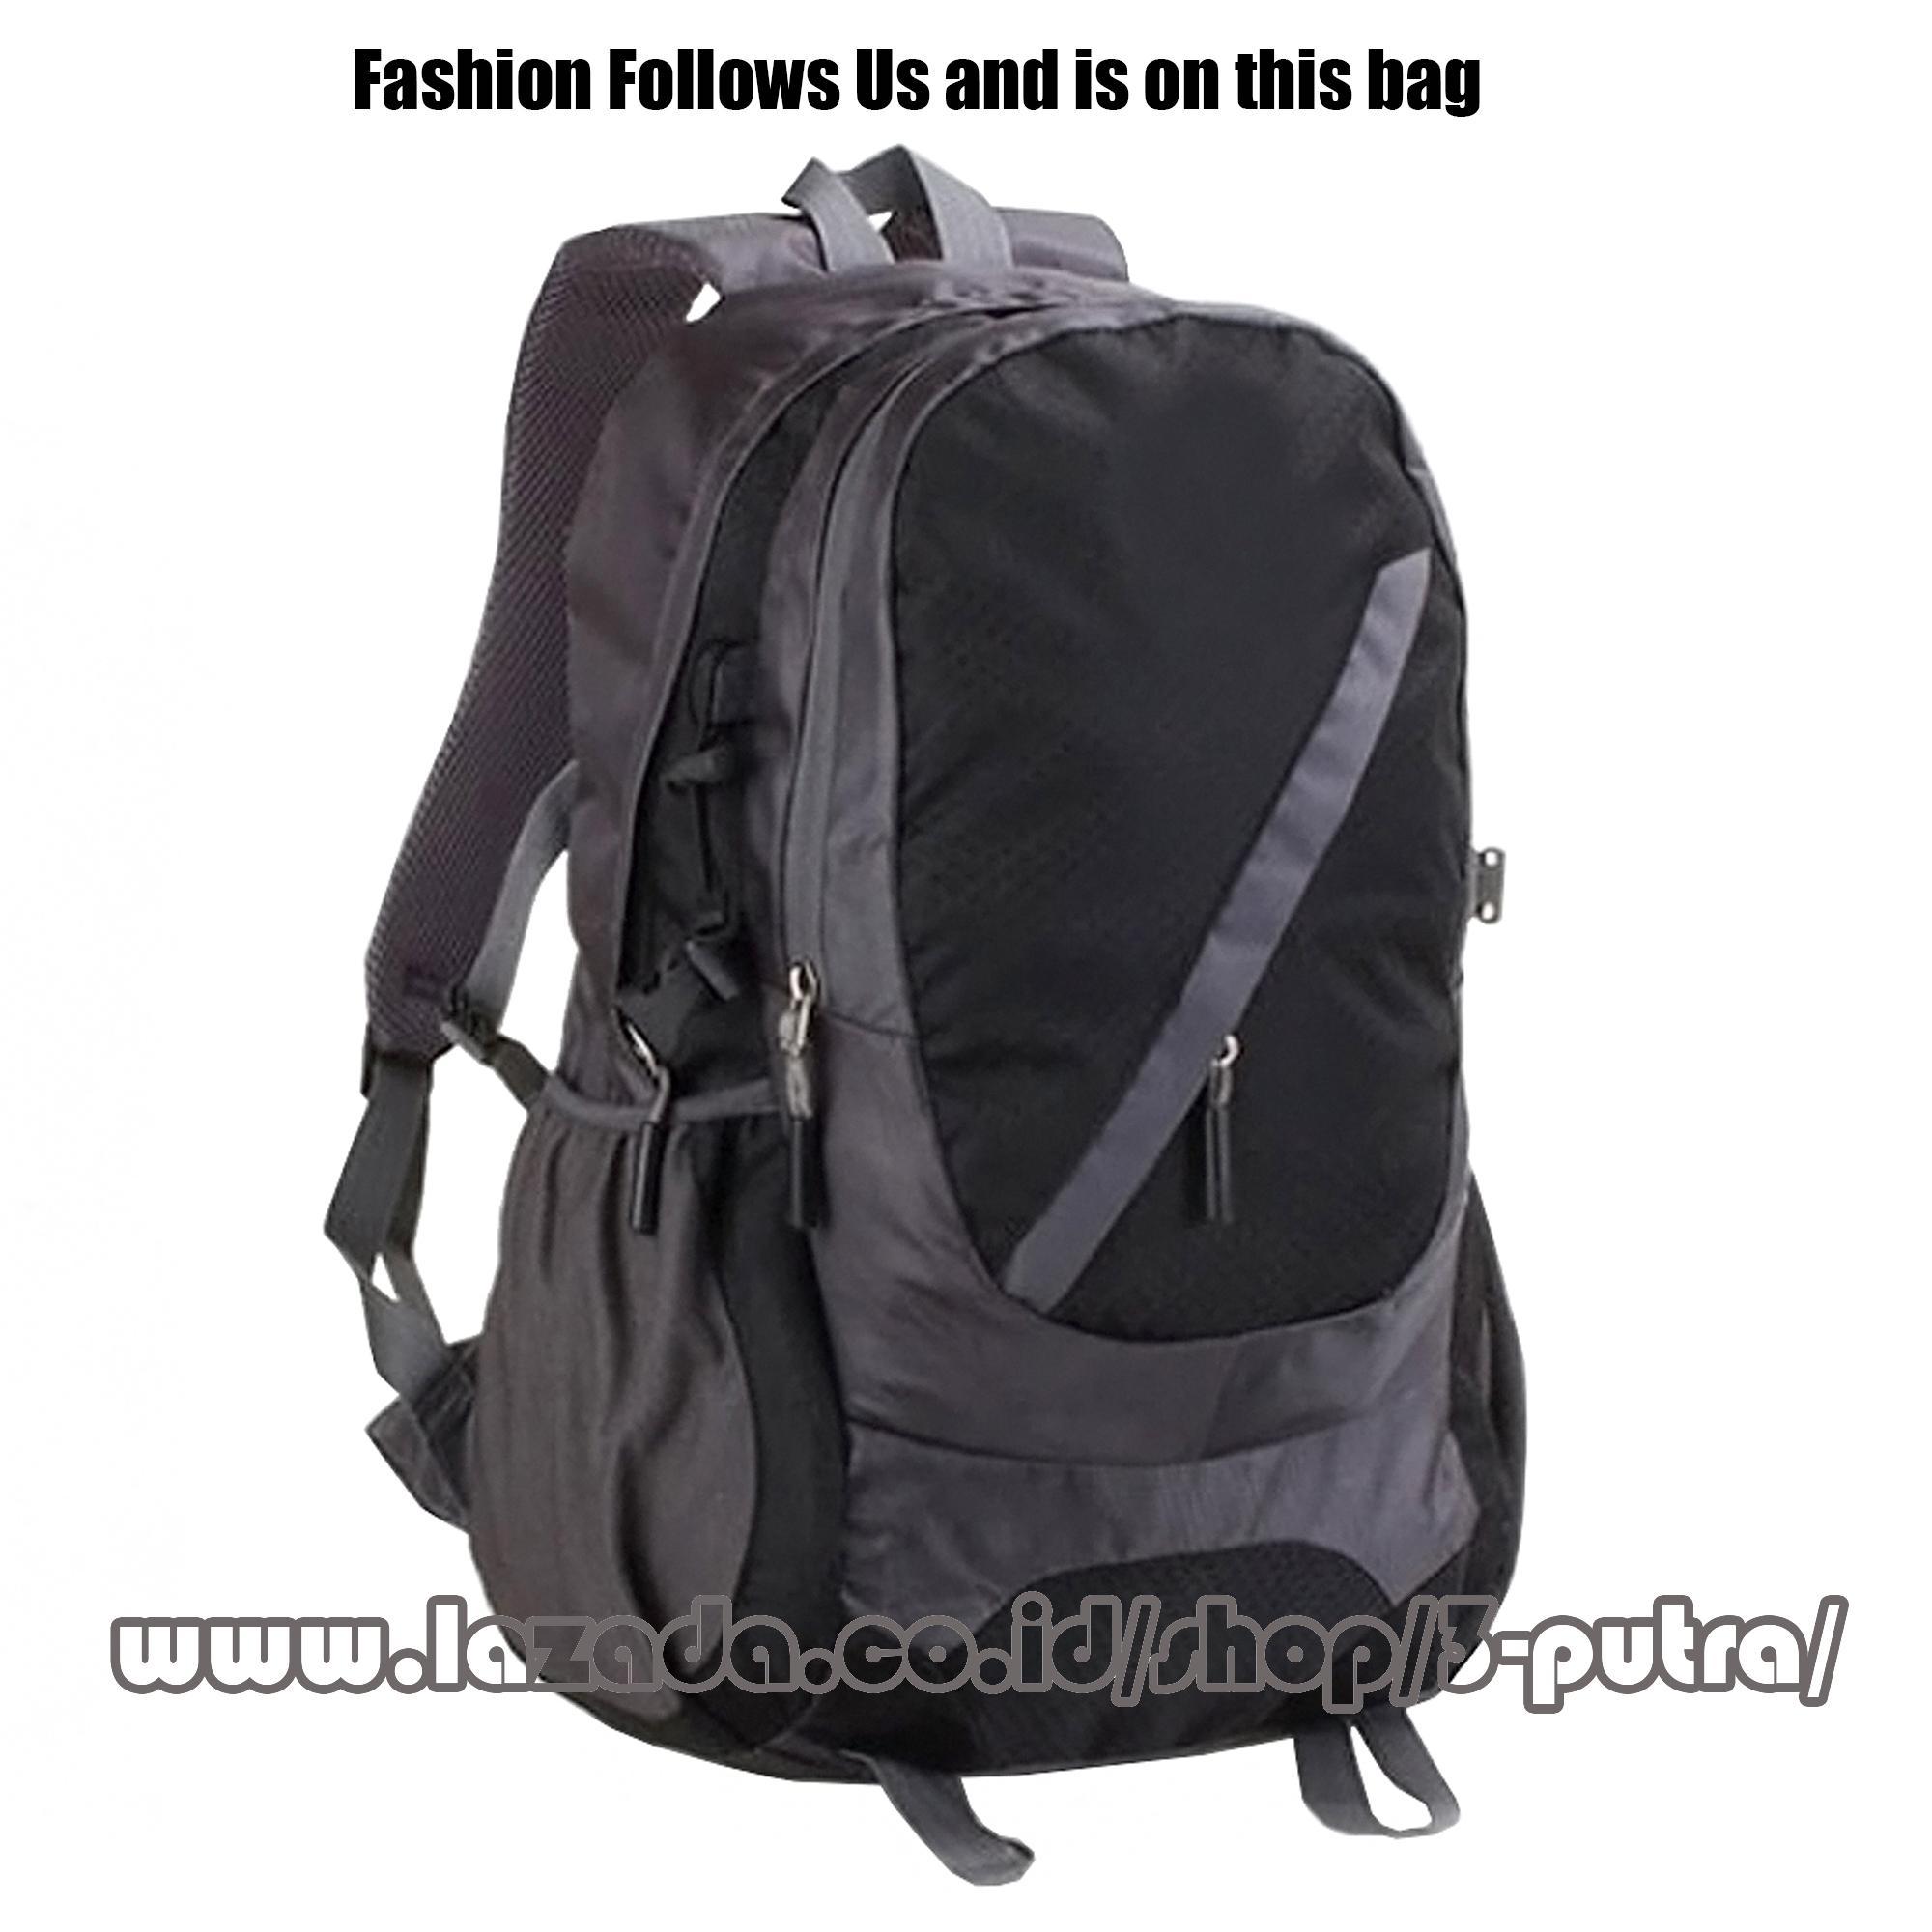 Tas Ransel Import Tas Punggung Backpack Traveling Backpack Import Tas Laptop Tas sekolah - 3P New